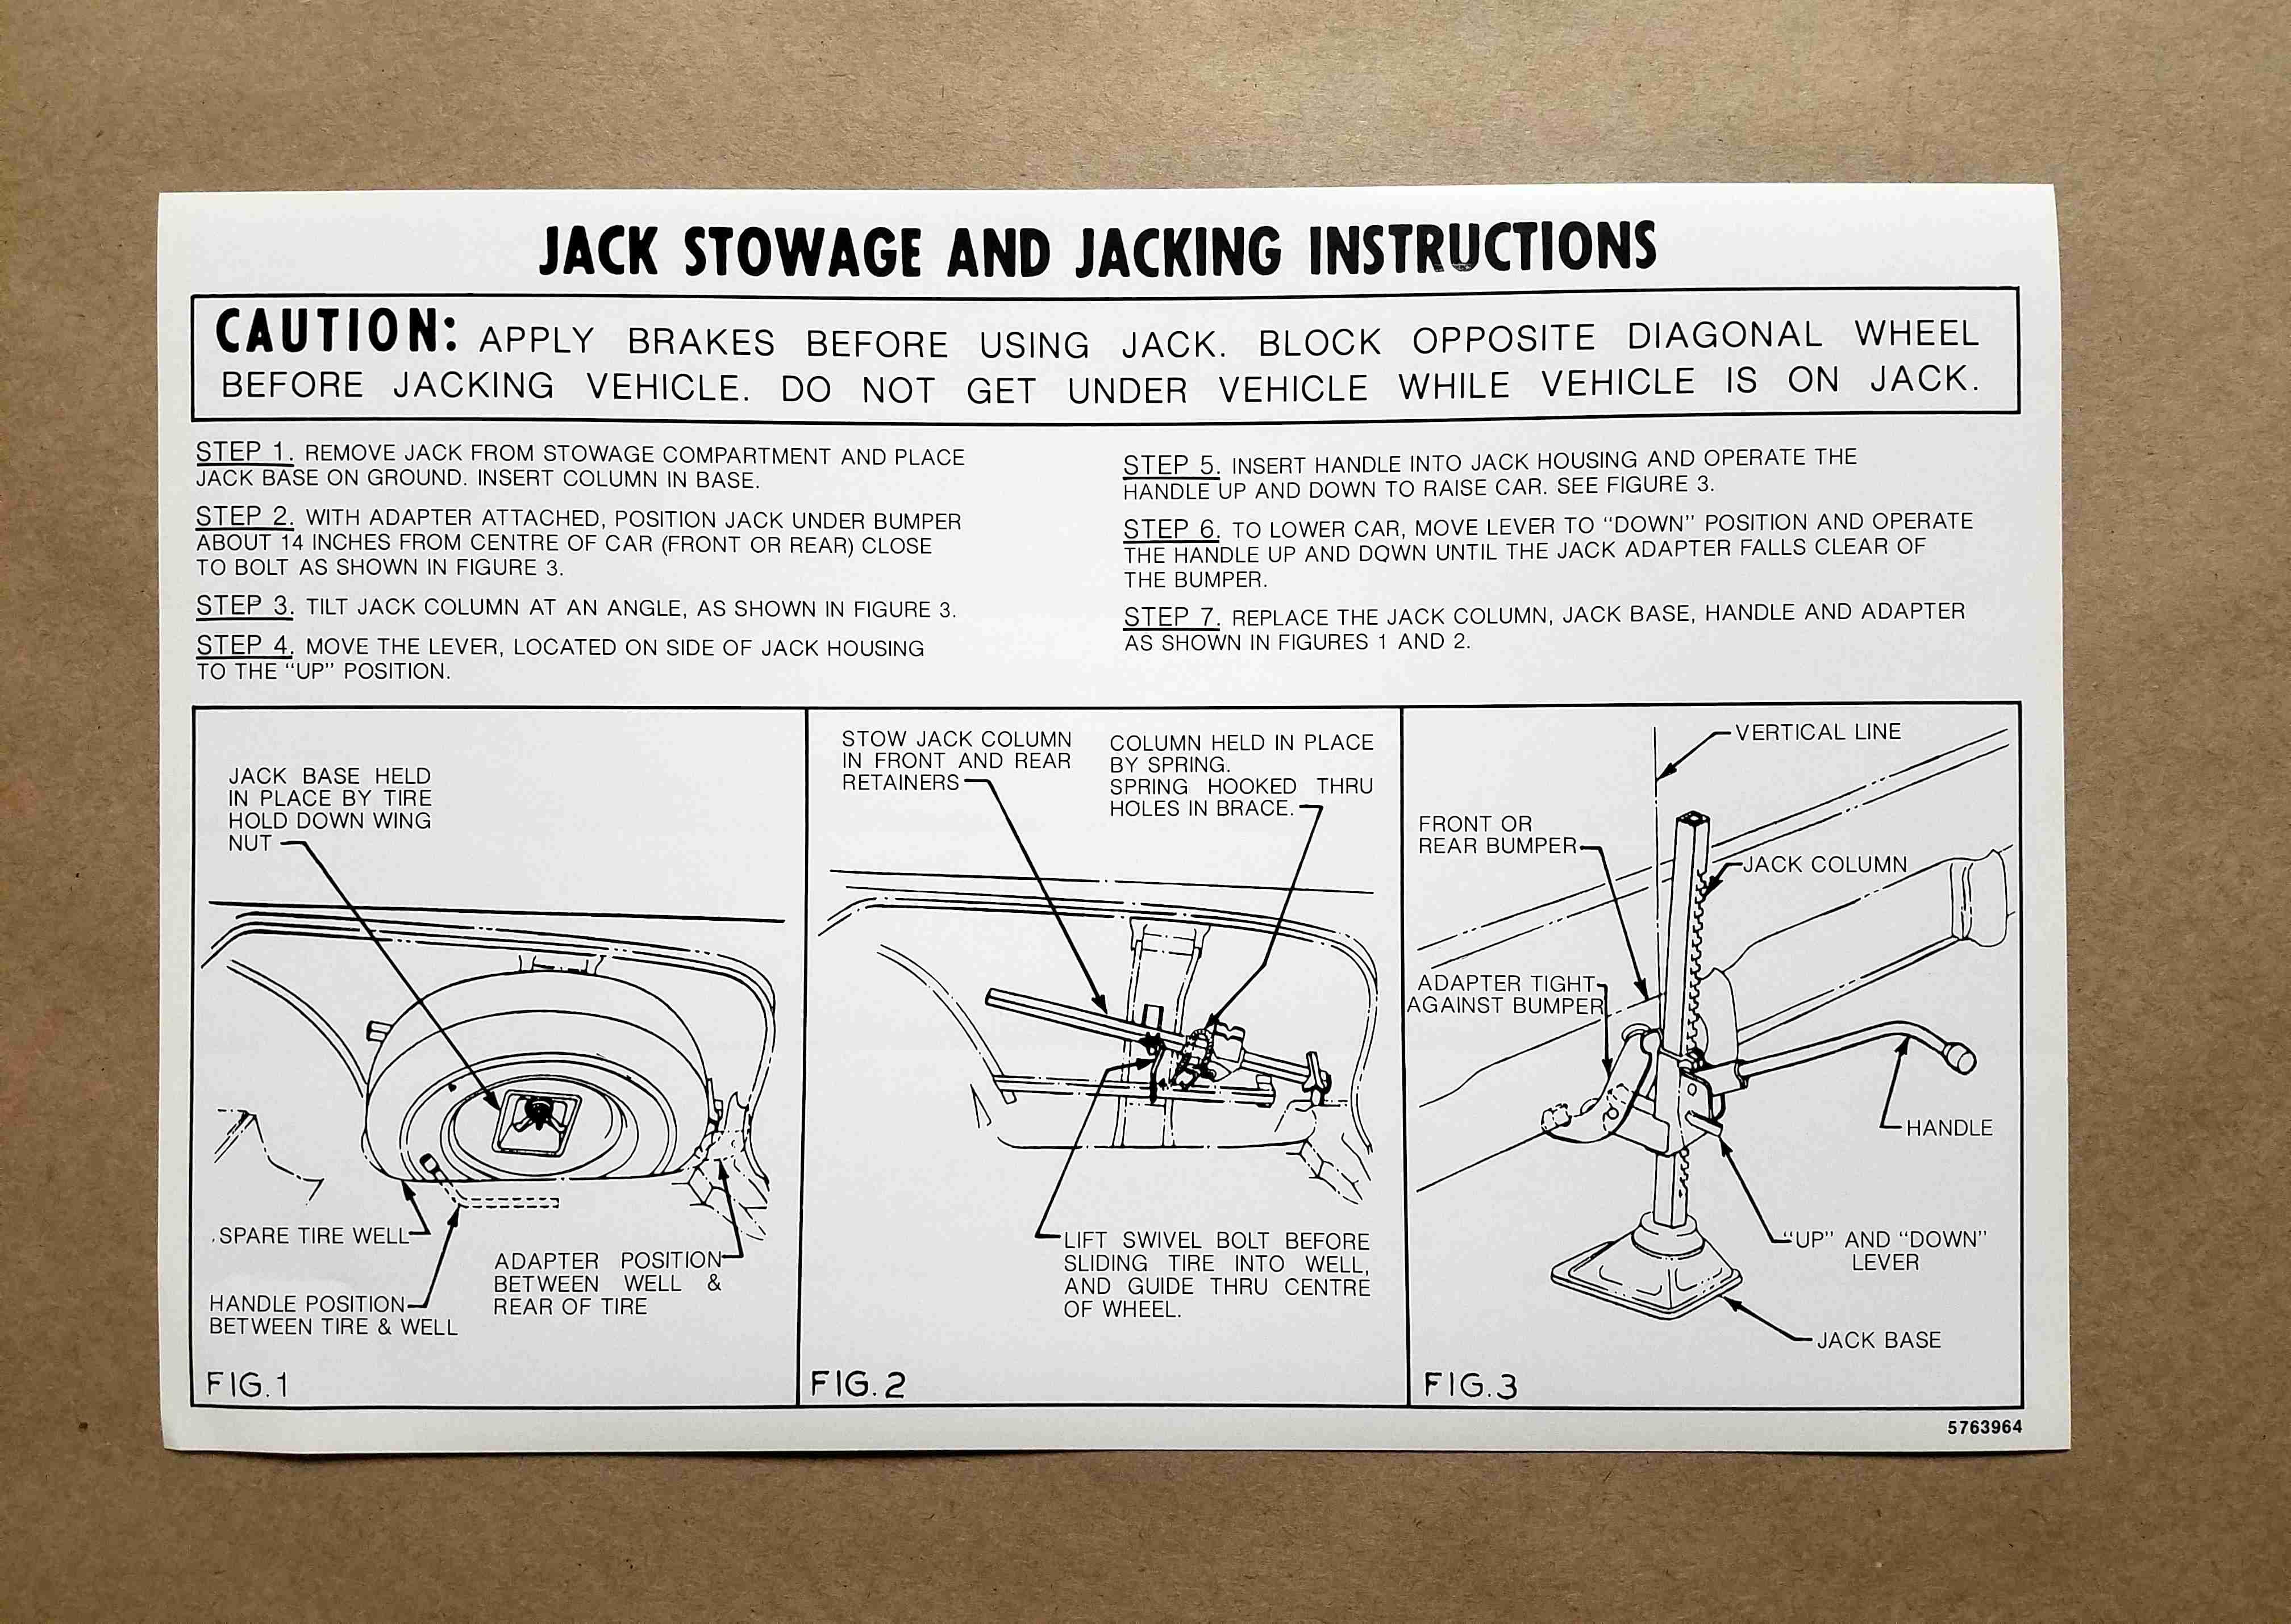 1958 Jack Instruction Card, on card: 5763964